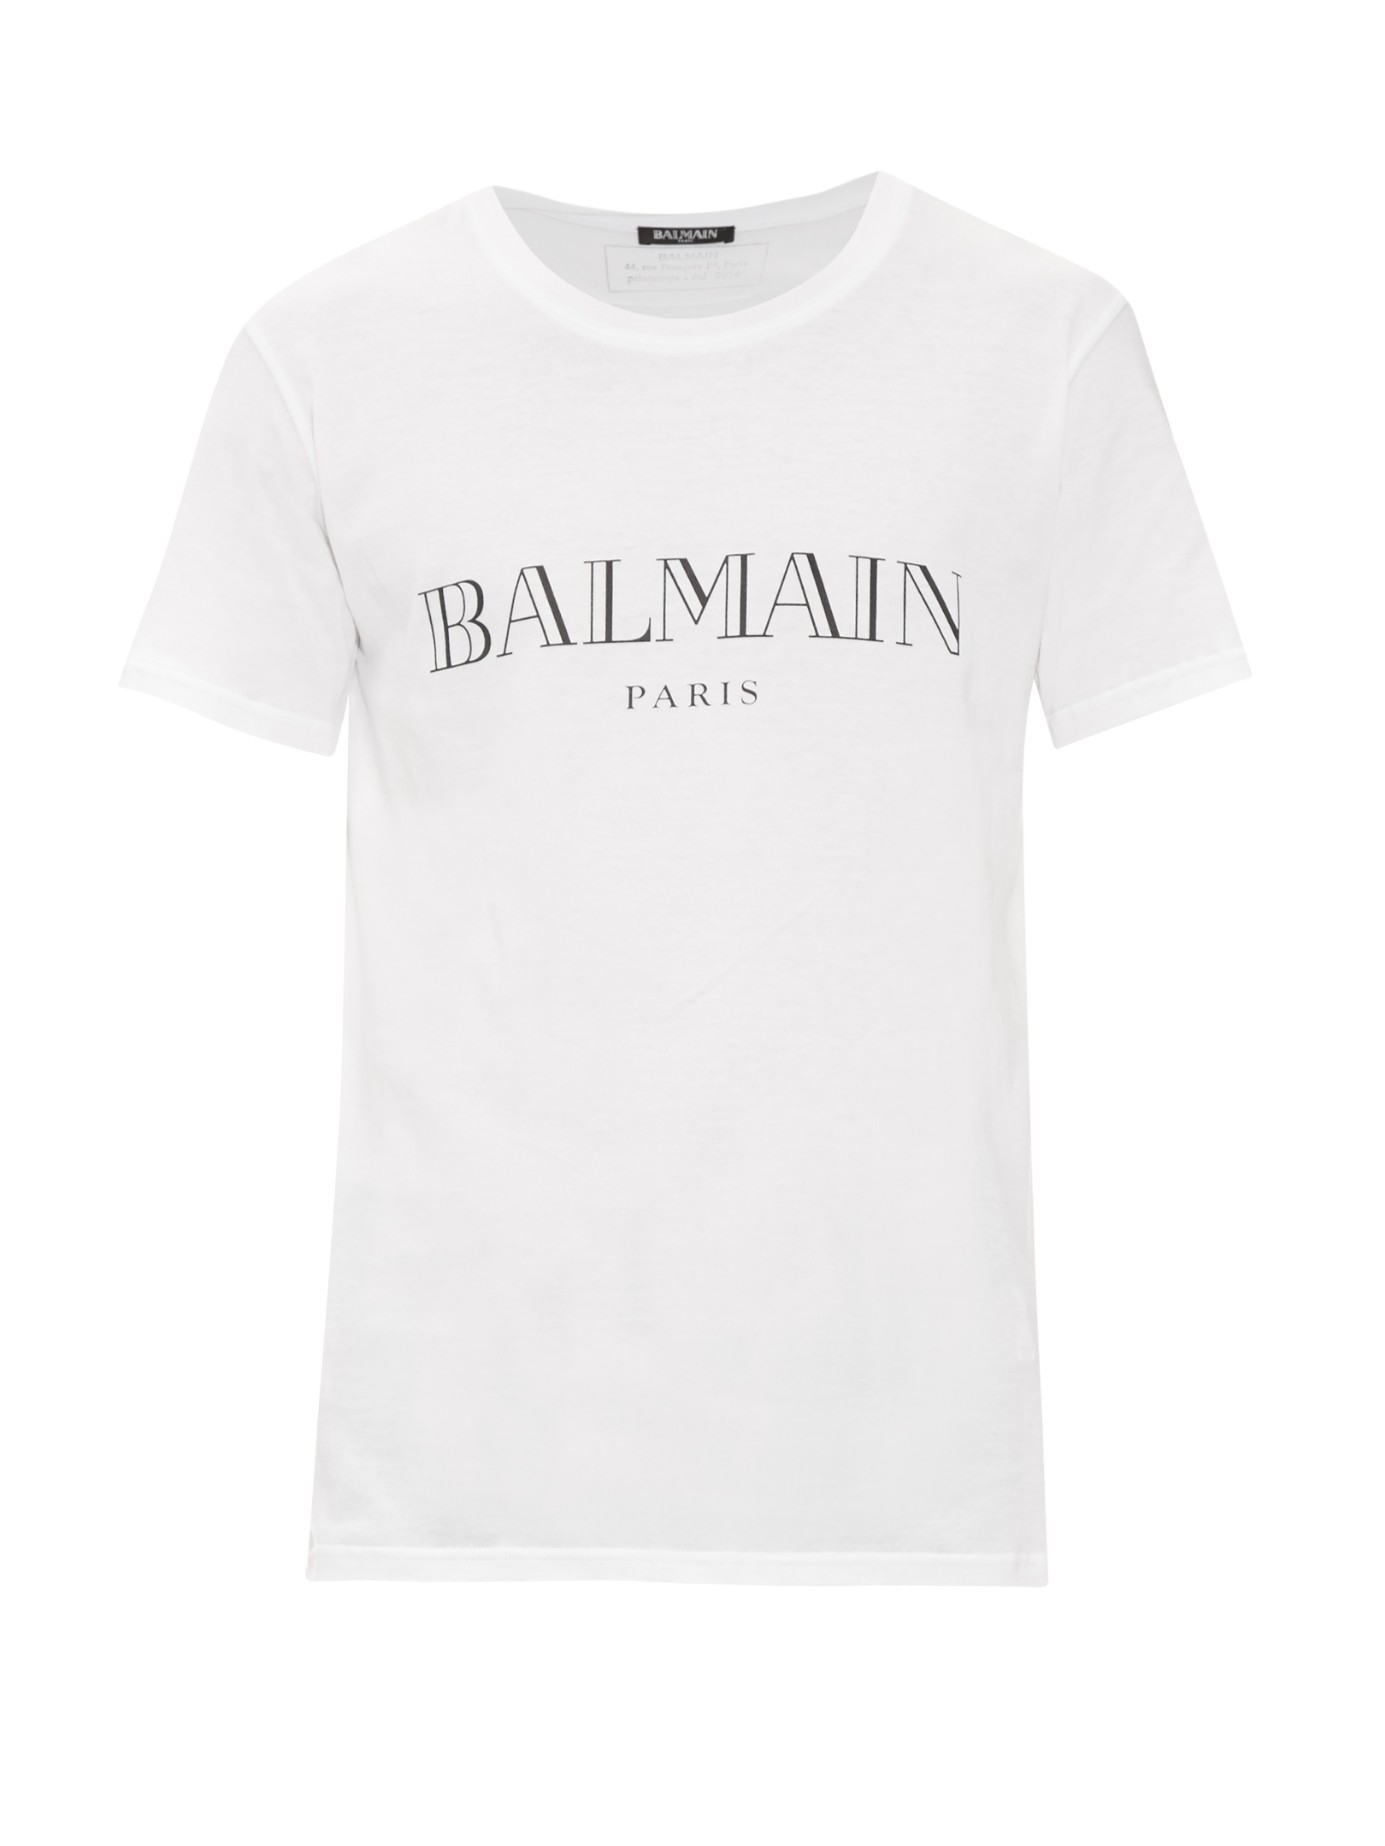 balmain logo print cotton t shirt in white for men lyst